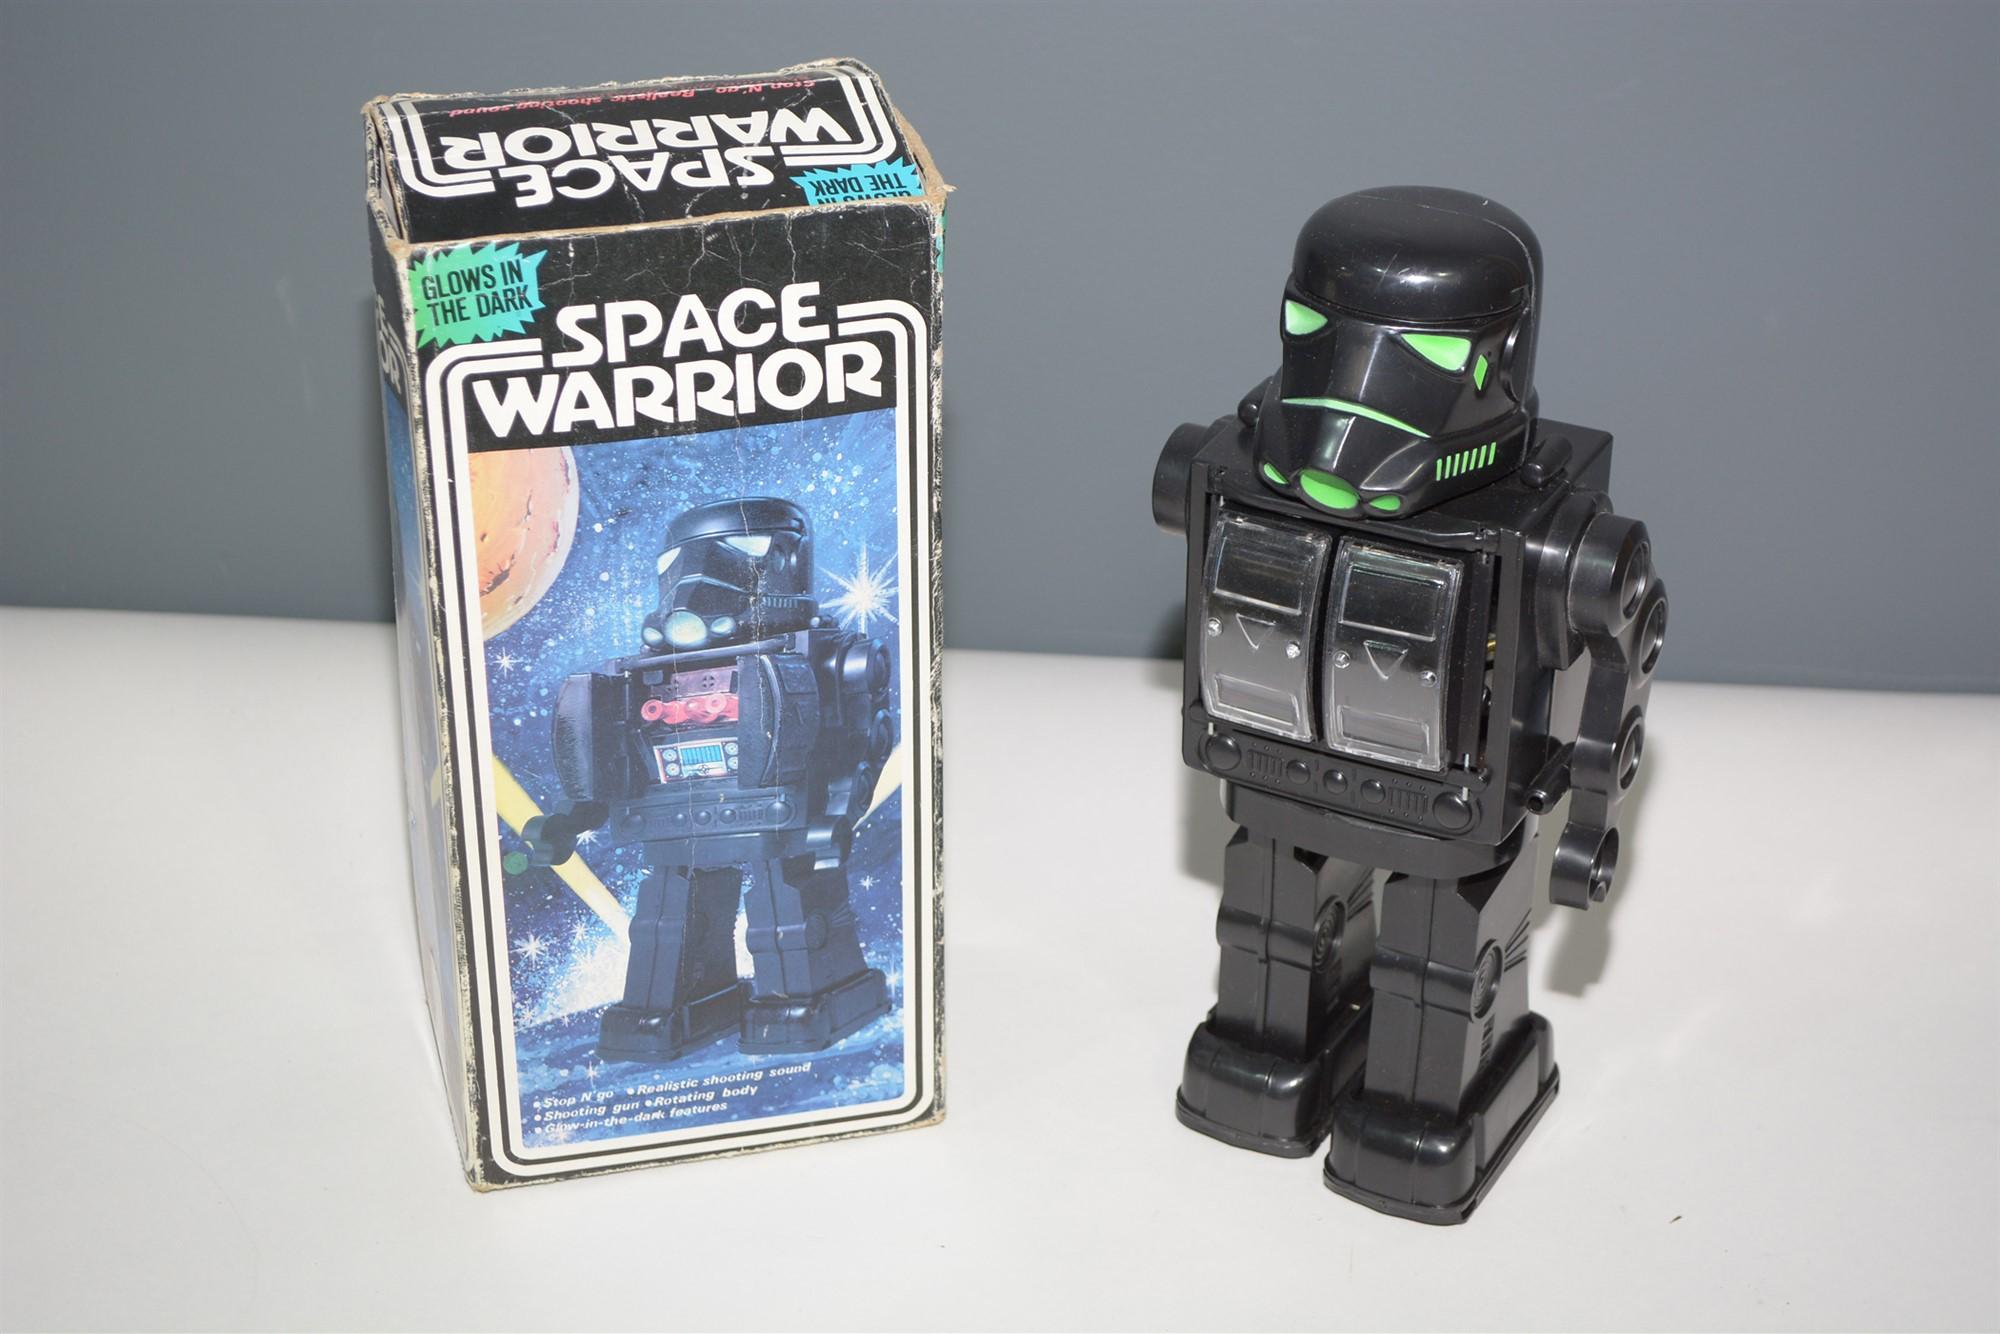 Lot 1021 - Space Warrior Robot